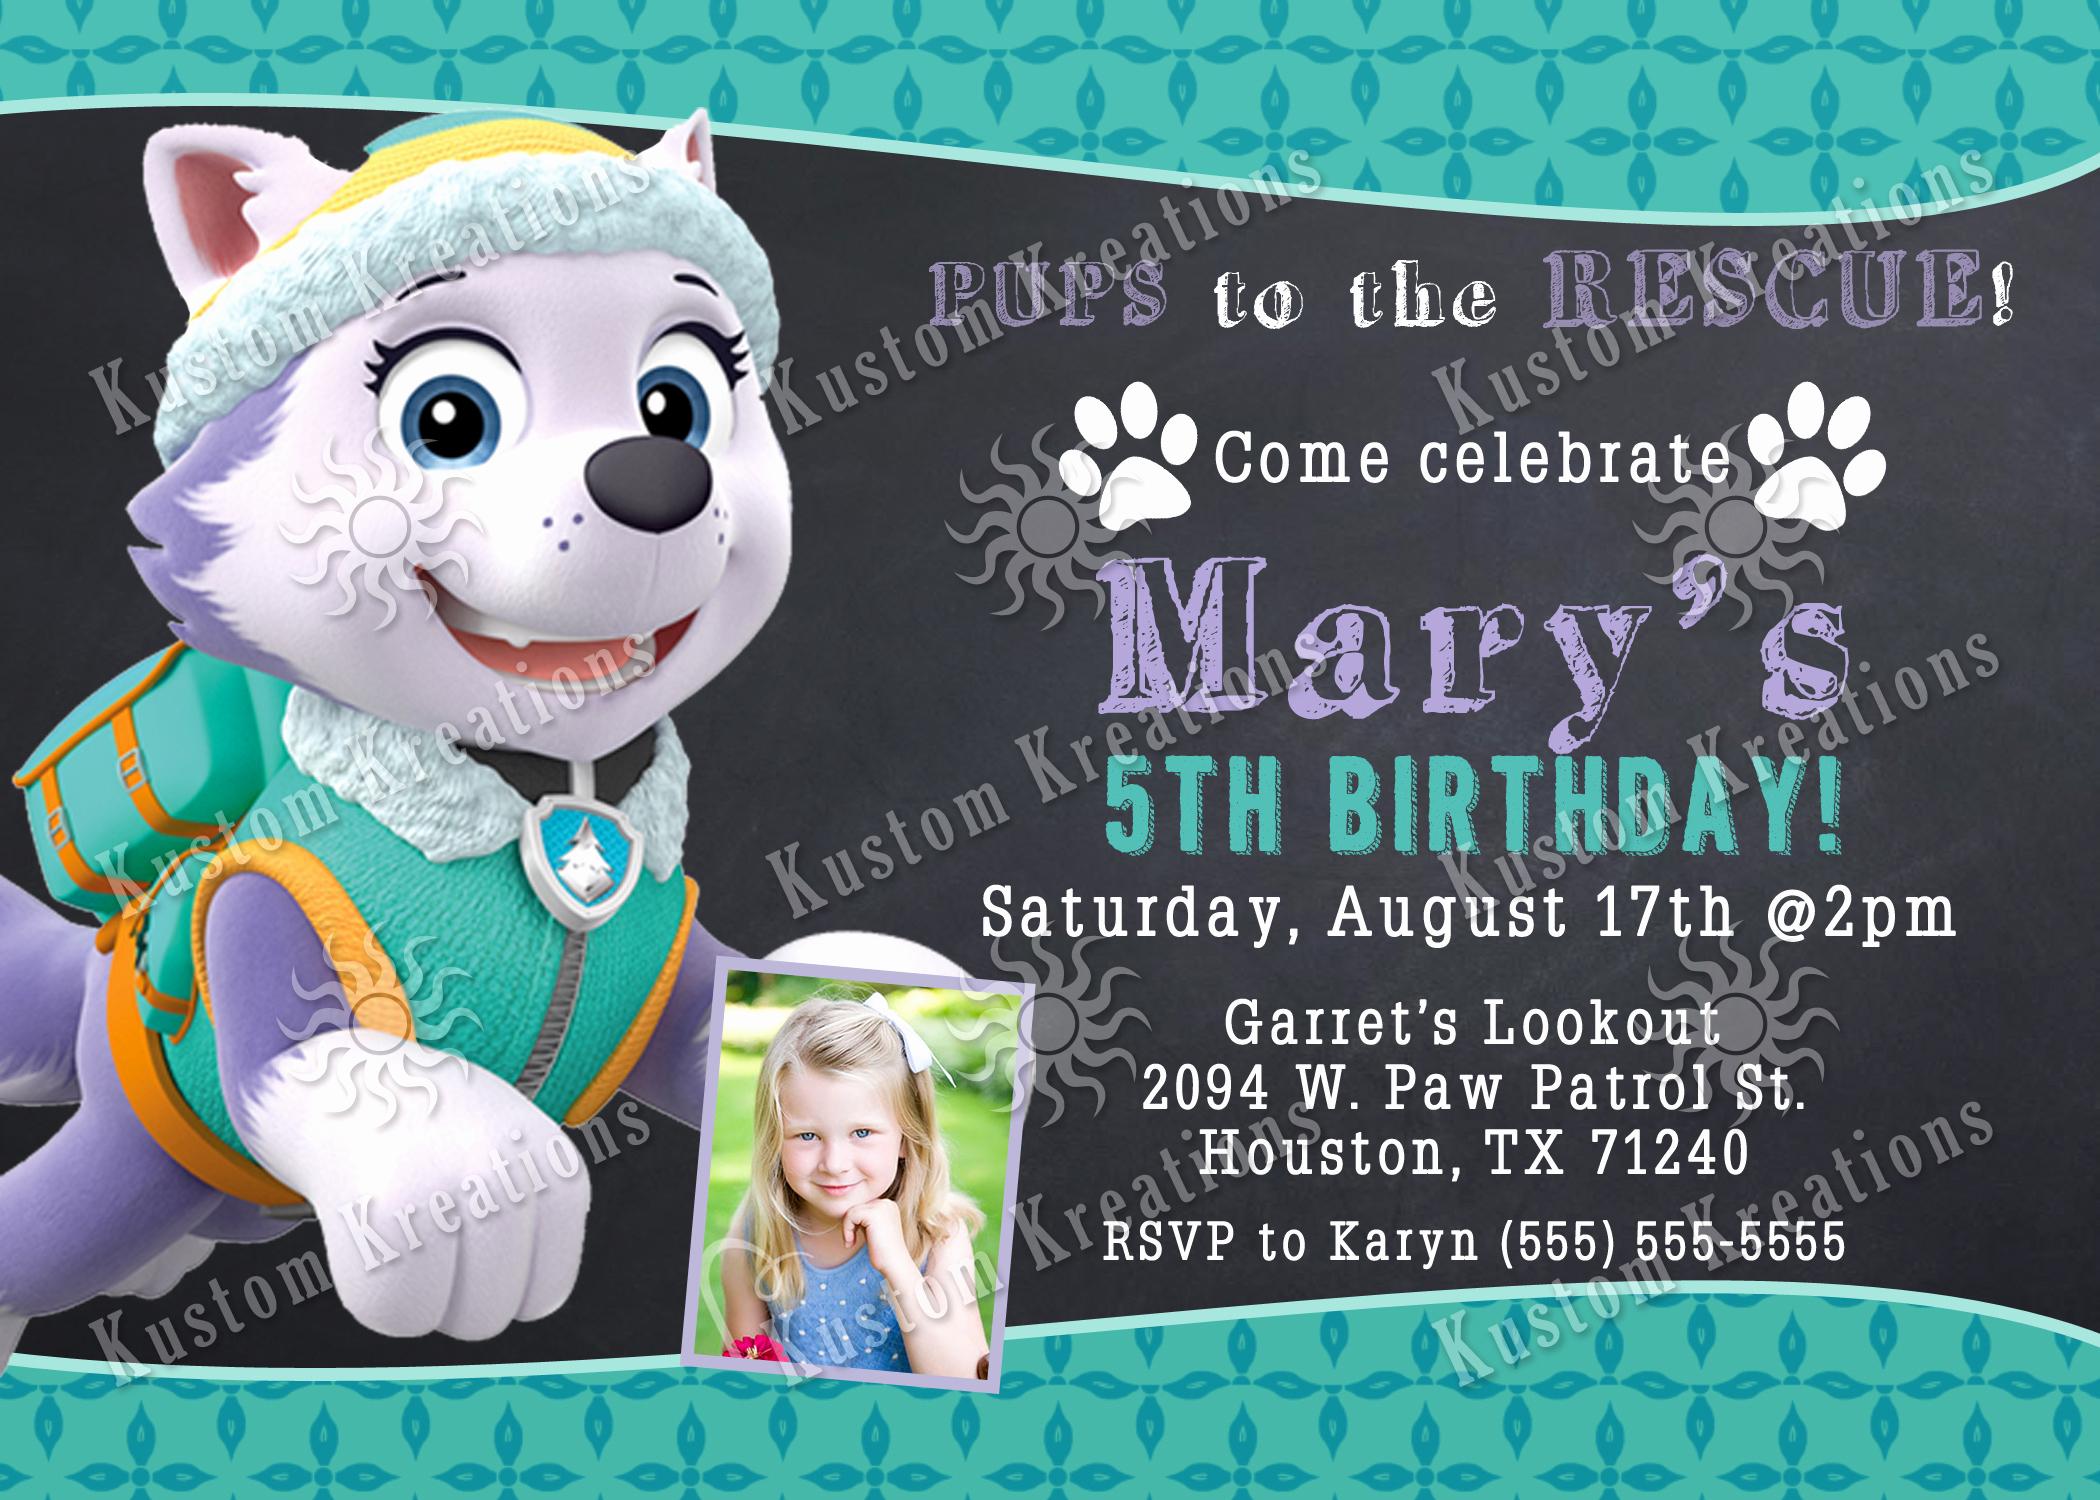 Paw Patrol Birthday Invitation New Paw Patrol Birthday Invitations